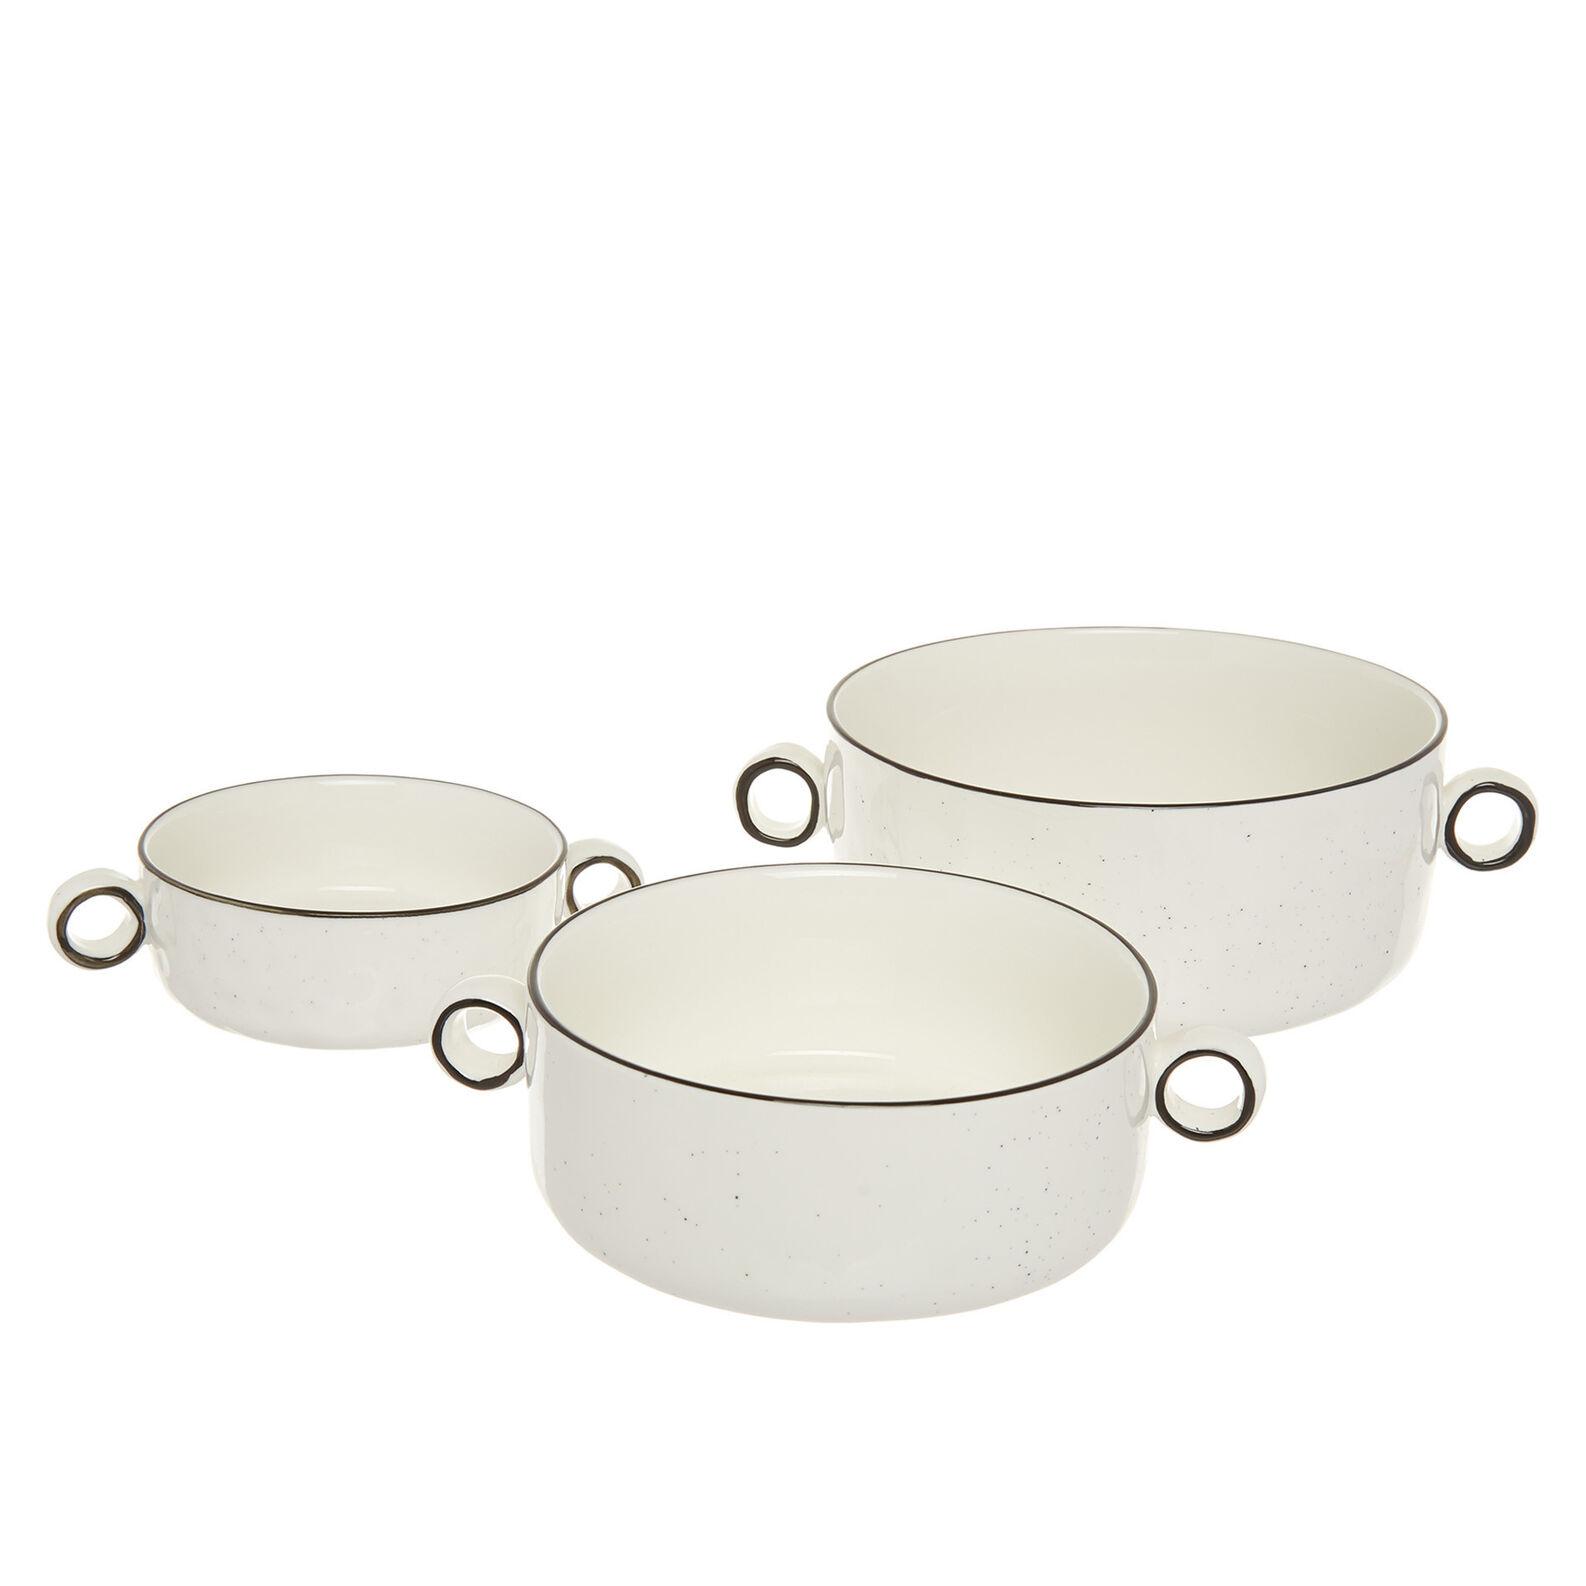 Ginevra small porcelain bowl